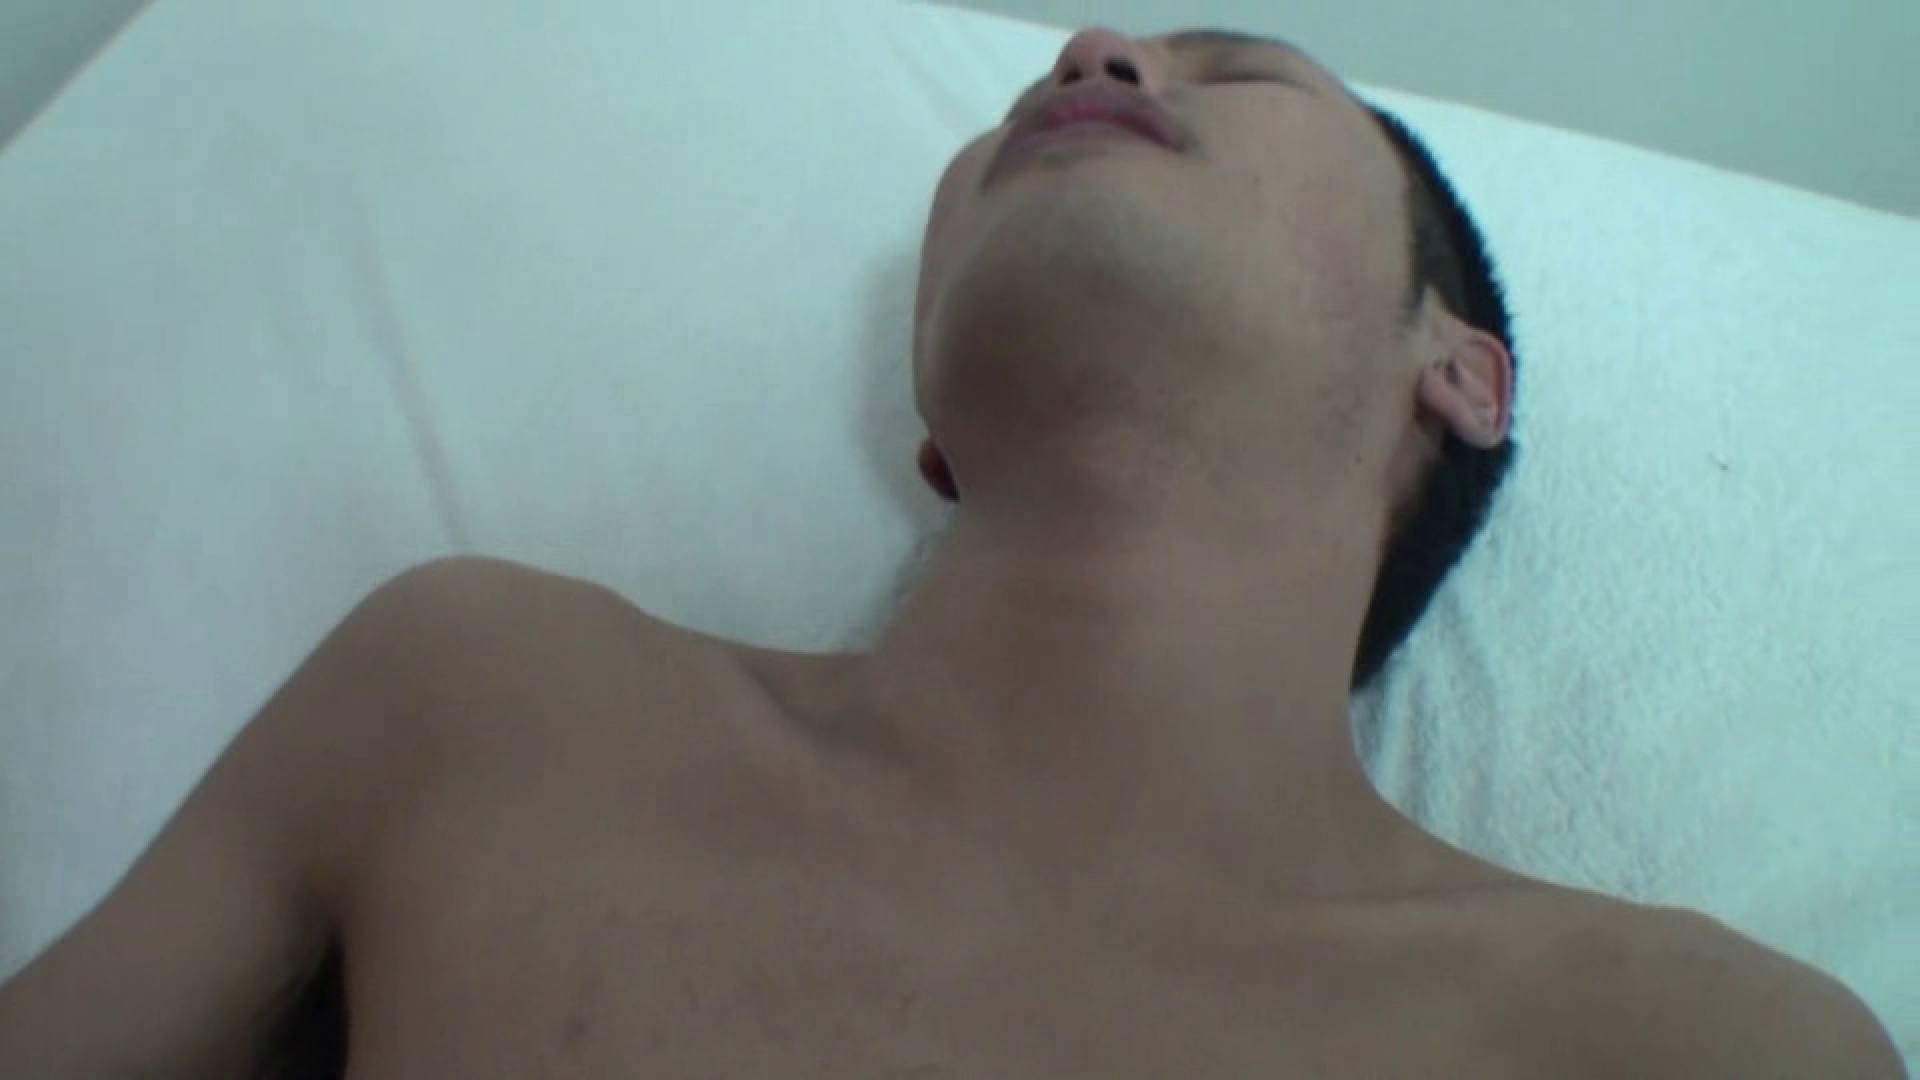 HD 良太と健二当たり前の日常 セックス編 VOL.03 セックス ペニス画像 72連発 62